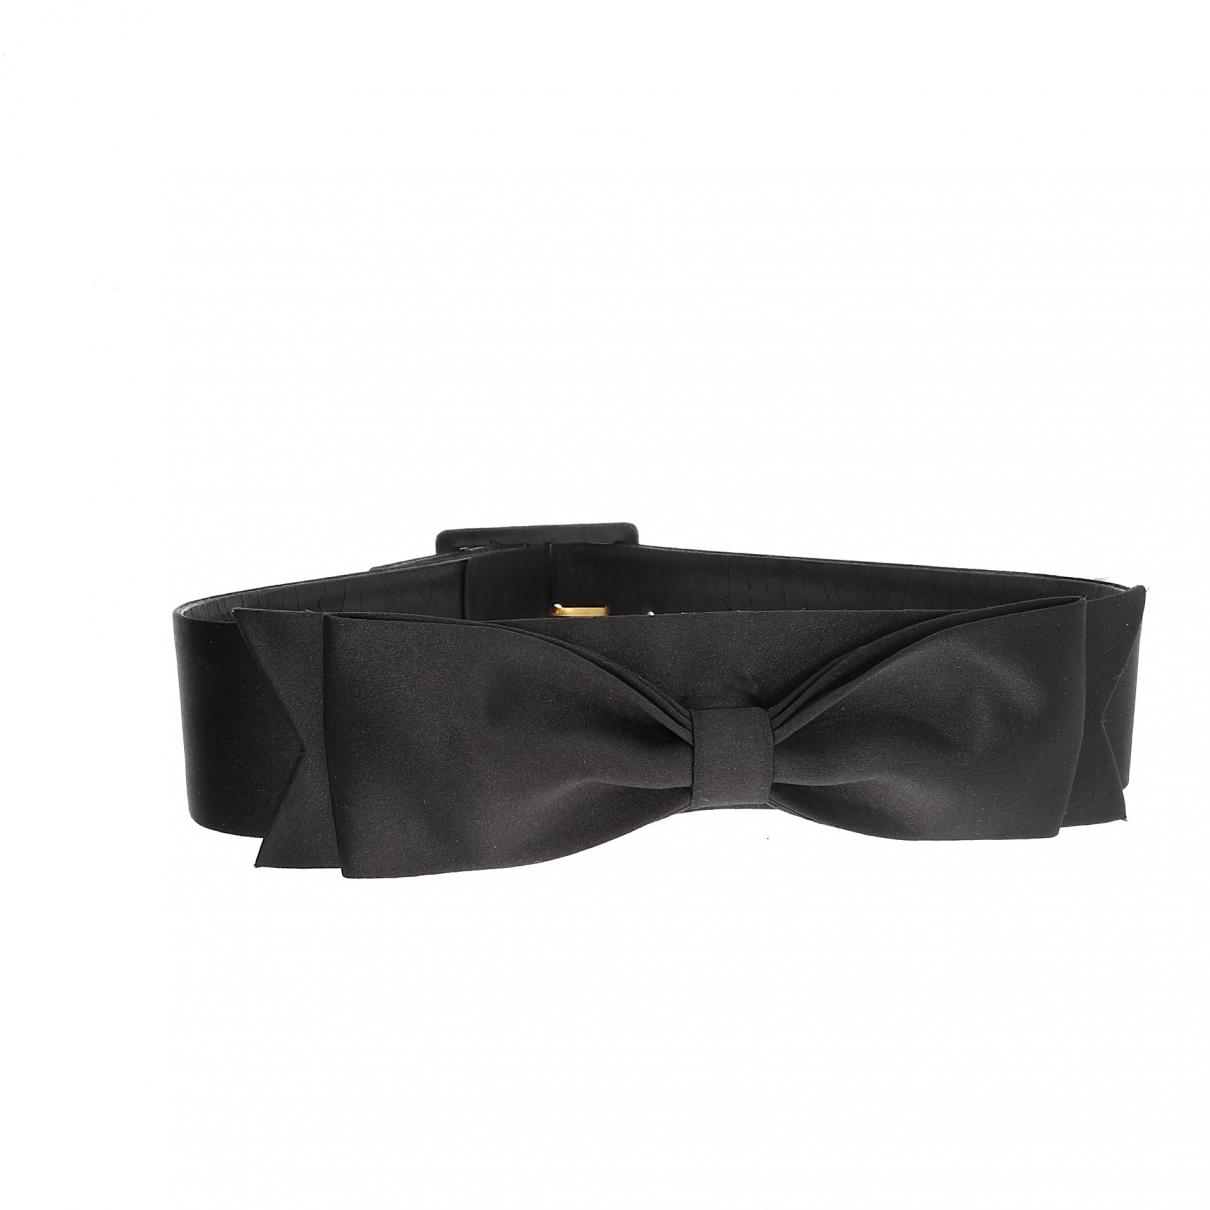 Chanel \N Black Cloth belt for Women 70 cm